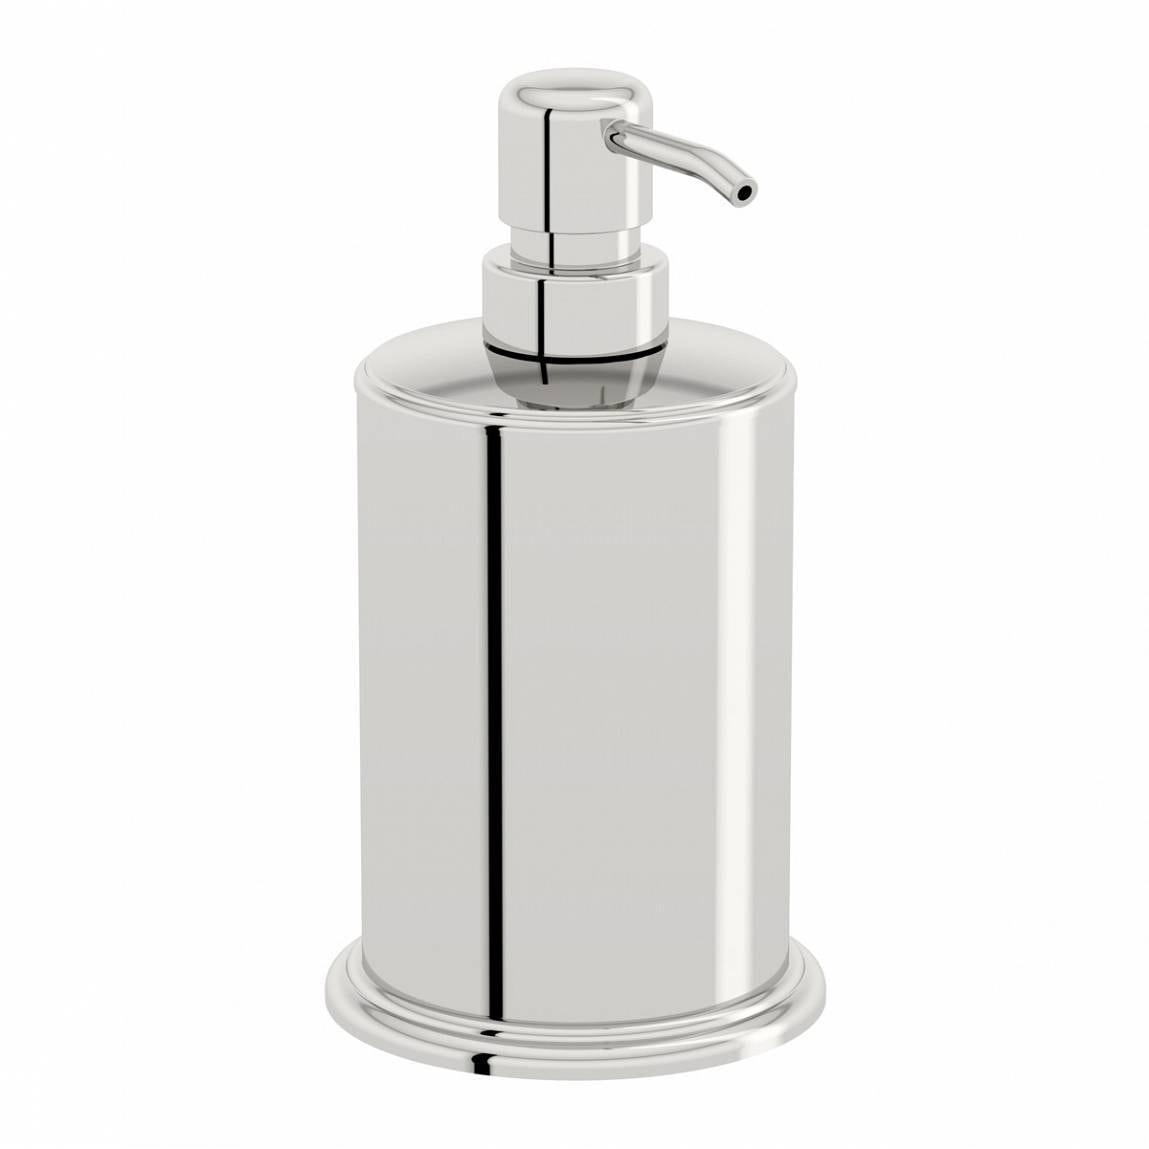 Orchard Options freestanding stainless steel soap dispenser